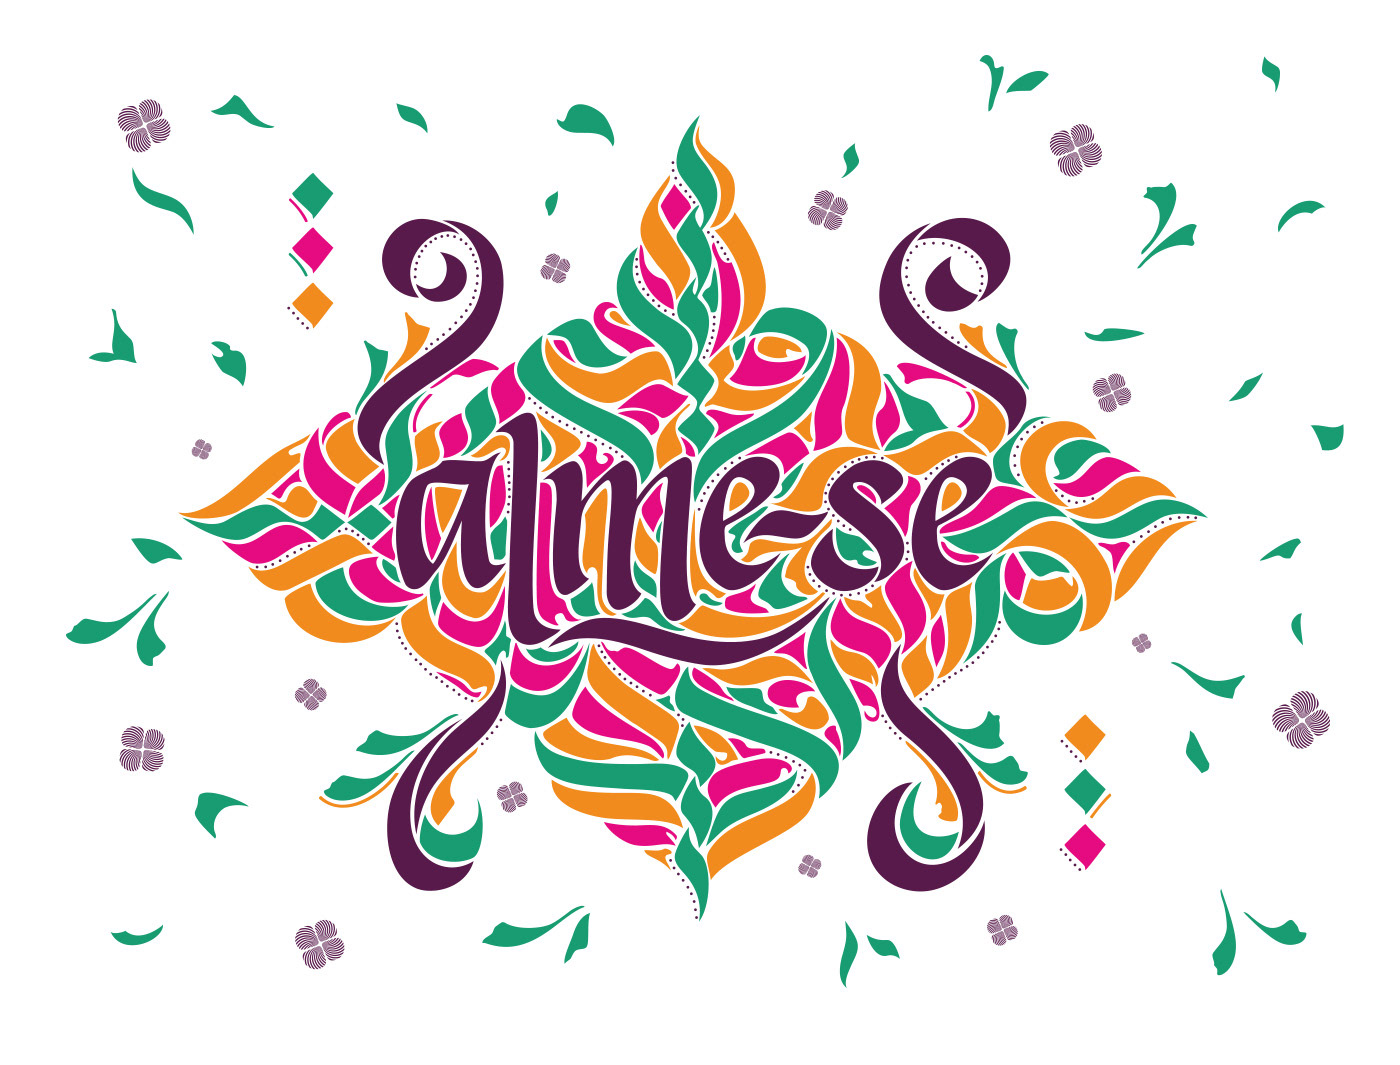 #Calligraphy,#illustration,#ecocopo,#letter  ,#caligraffiti,#Tailandia,#praia,#evento,#Sustentabilidade,#Arte